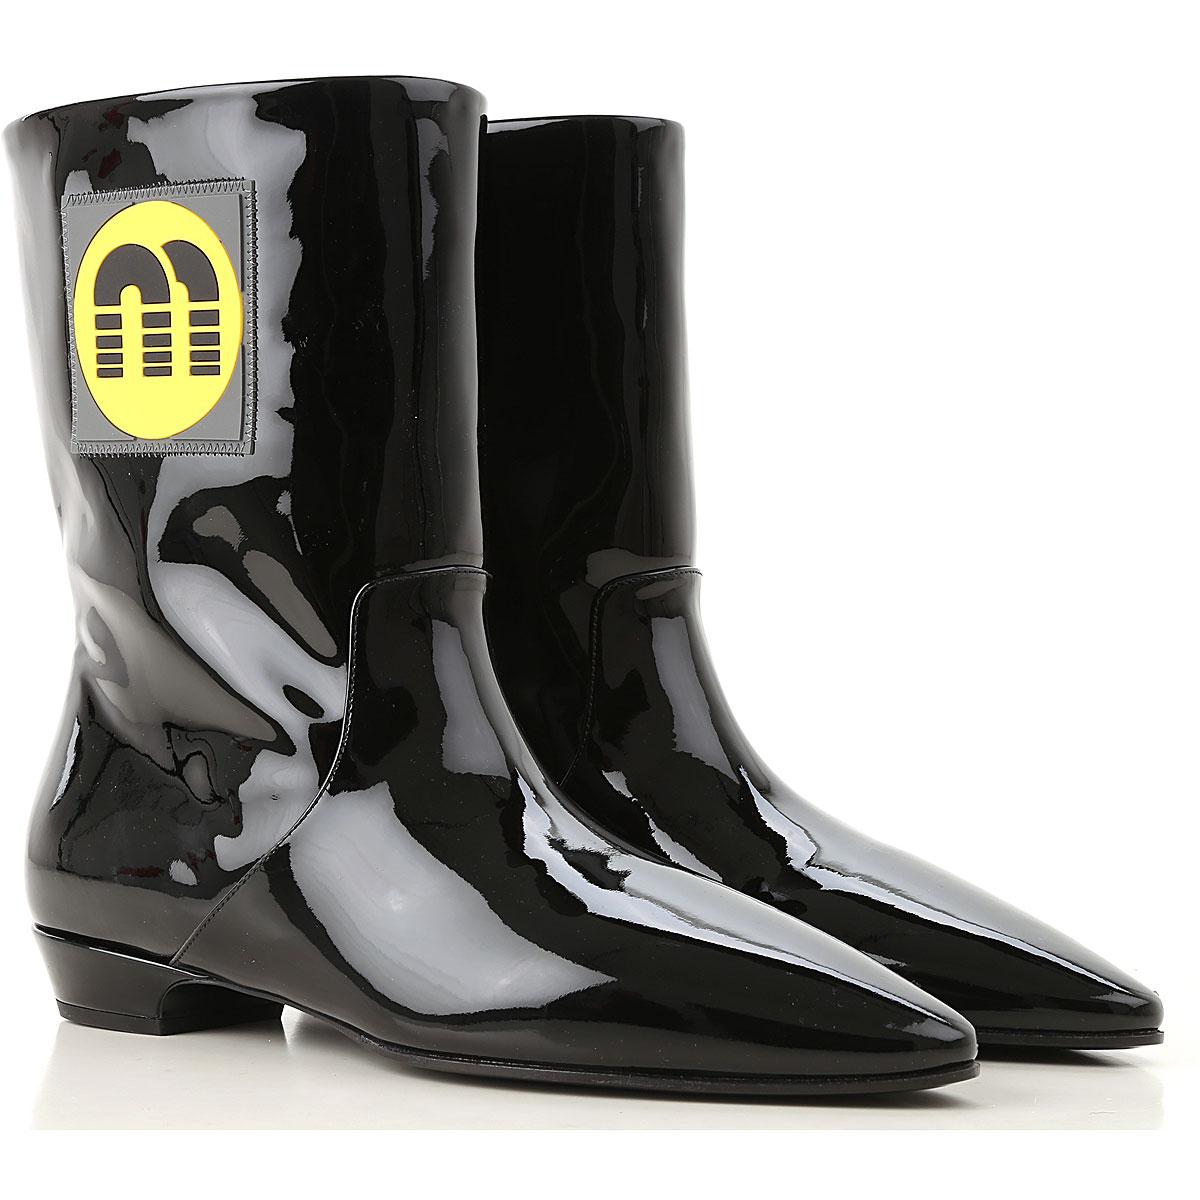 Image of Miu Miu Boots for Women, Booties, Black, Patent, 2017, 10 6 6.5 7.5 8 8.5 9